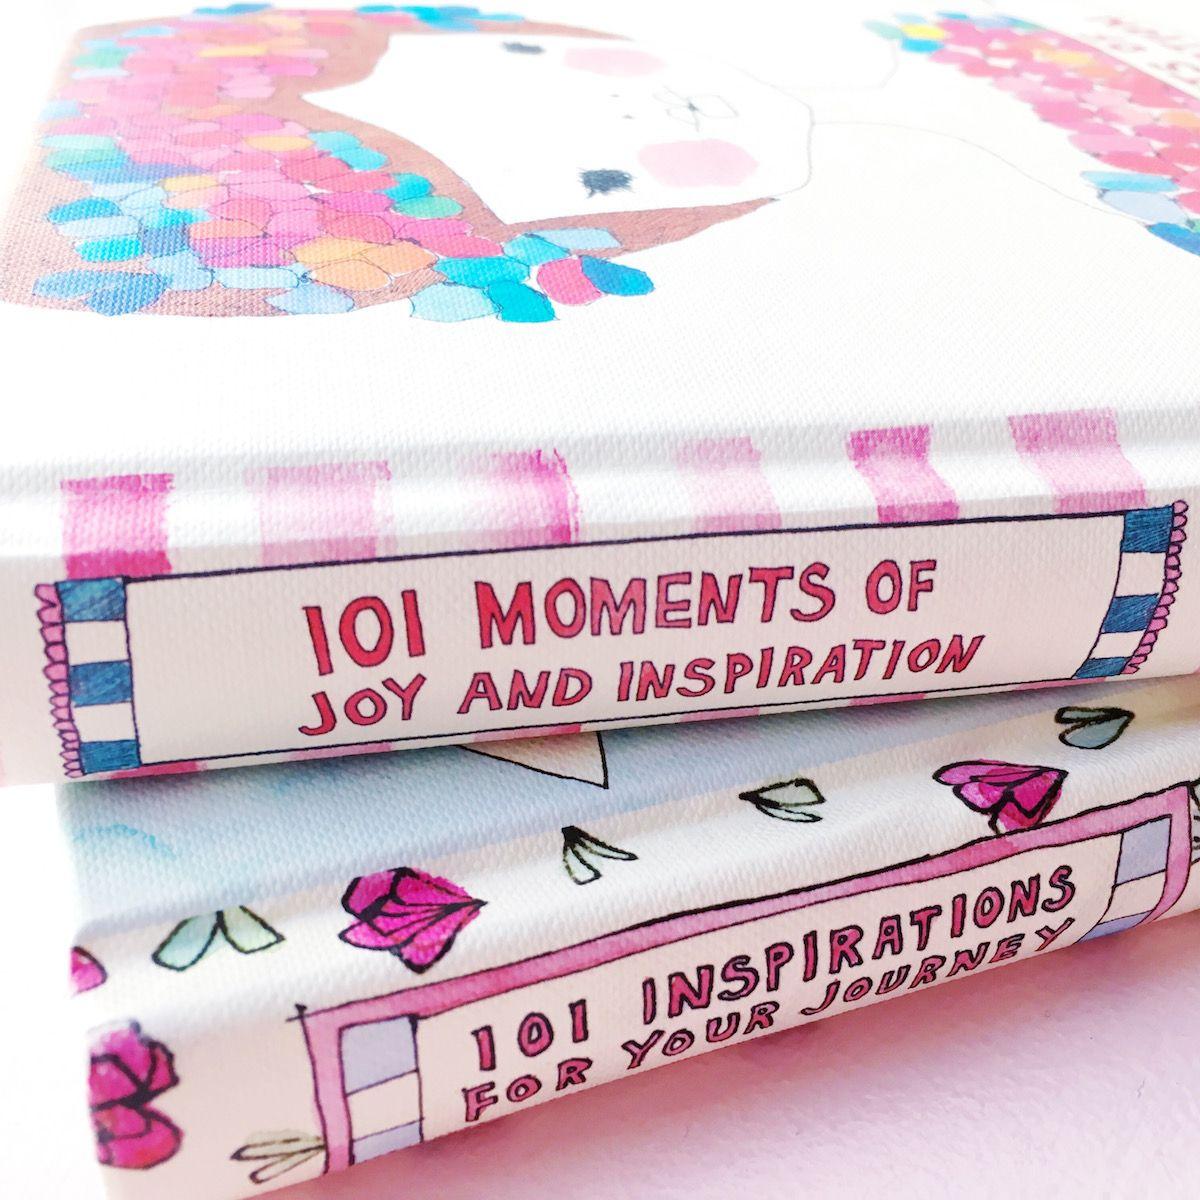 Buchtipp: 101 Moments of Joy and Inspiration & 101 Inspirations for Your Journey #bücher #lesen #wellness #entspannung #achtsamkeit